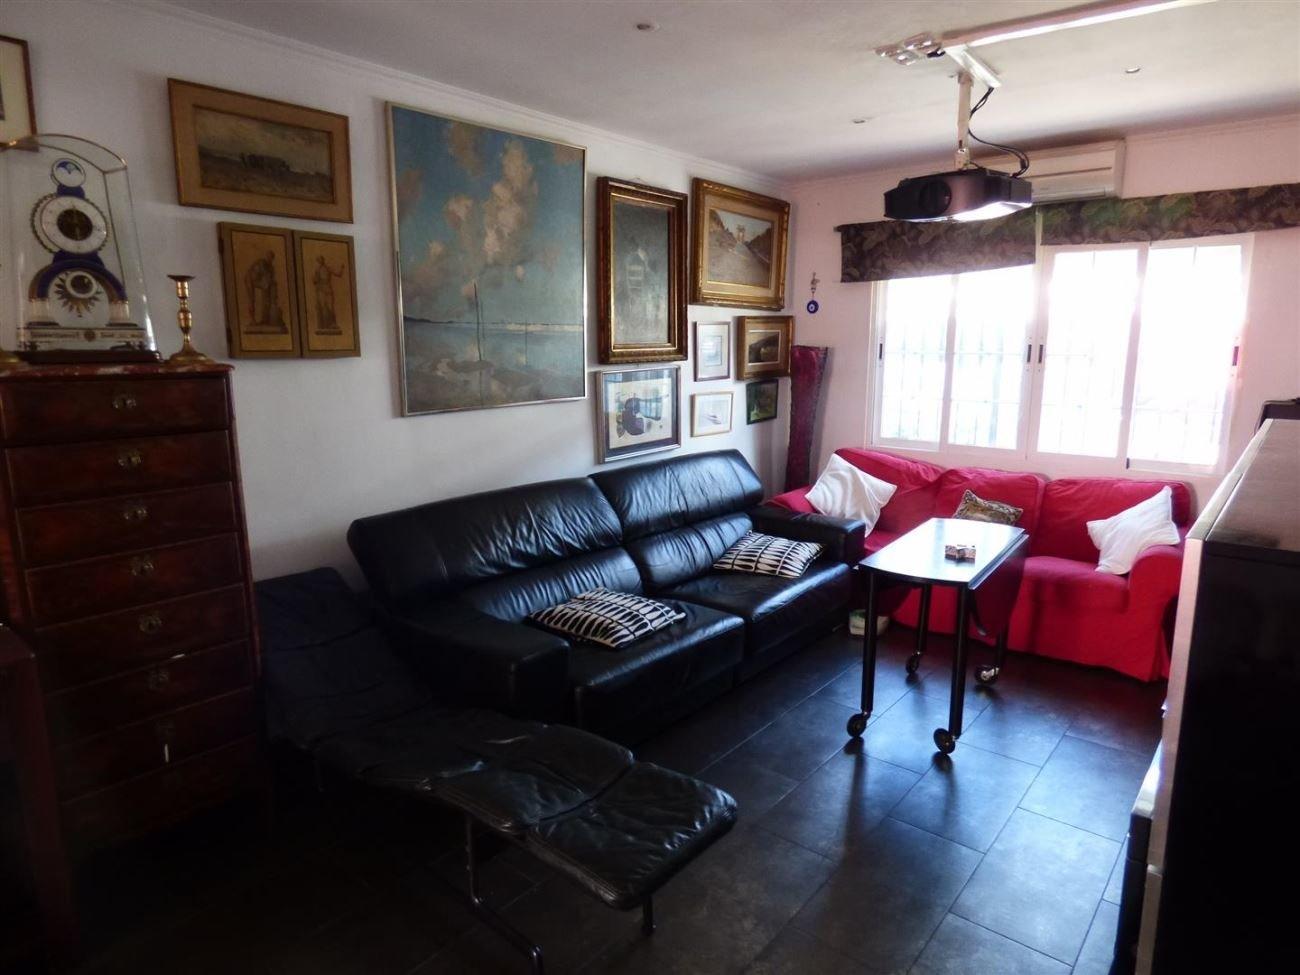 3 bedroom, 2 bathroom townhouse for sale in la cala de mijas